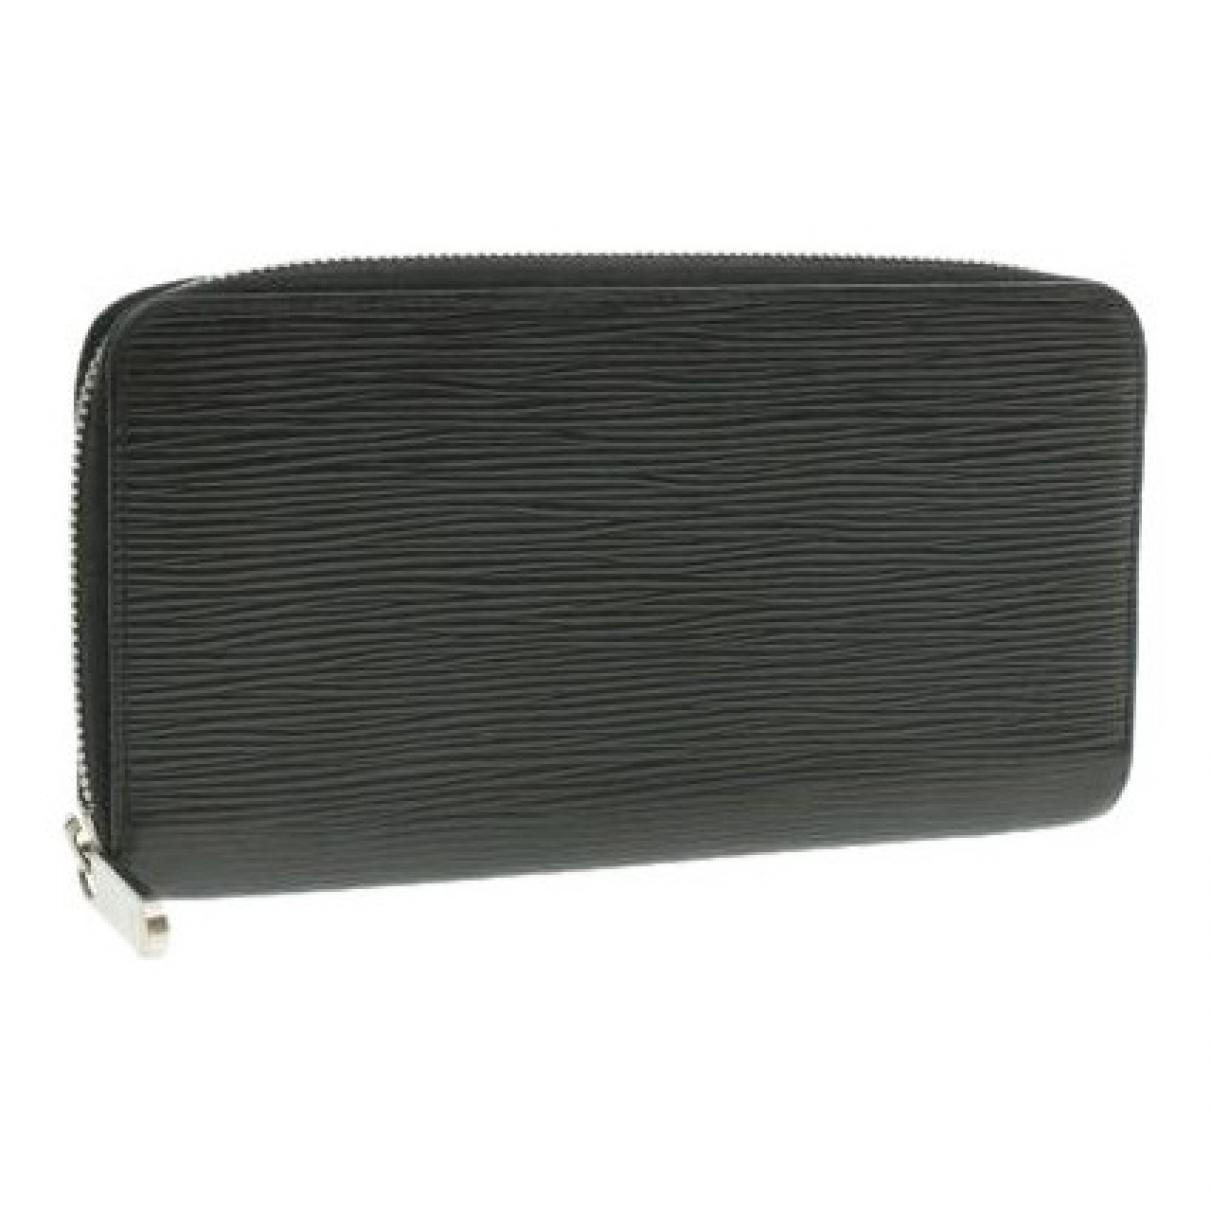 Louis Vuitton \N Black scarf for Women \N